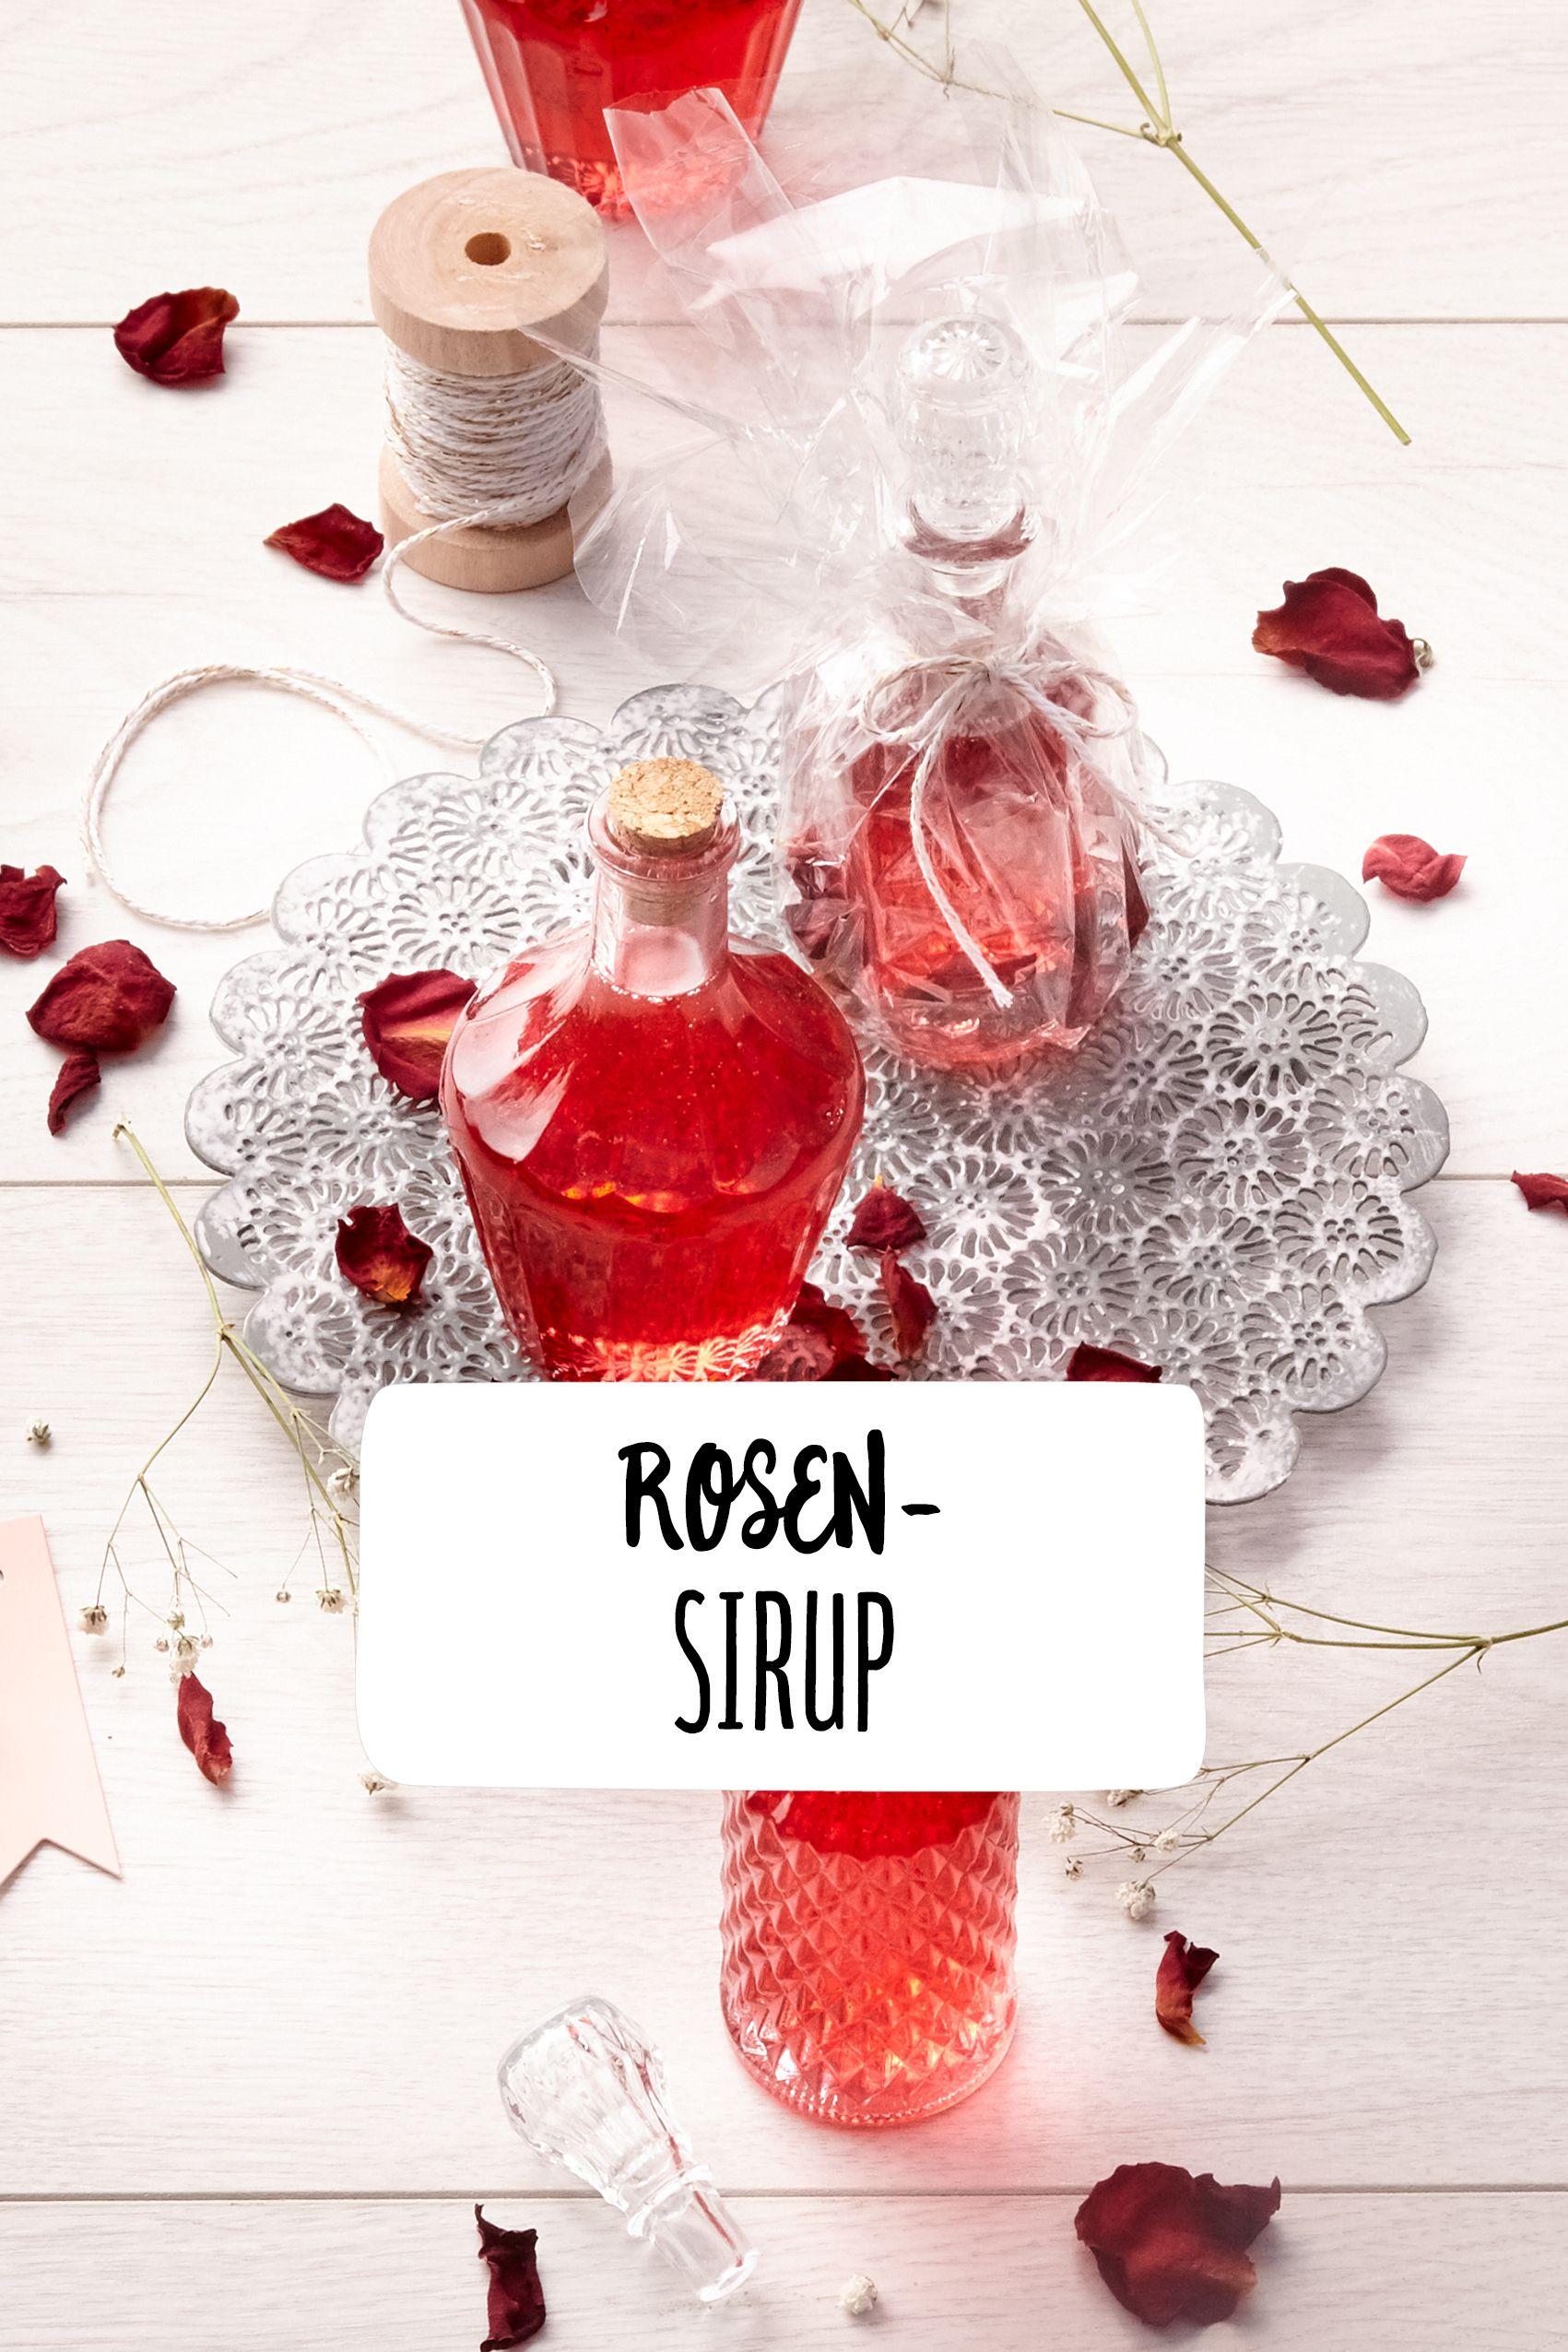 Rosensirup Drink Rosen Sirup Alkoholfrei Limonade Limonade Sommergetranke Rosensirup Rosen Sirup Alkoholische Getranke